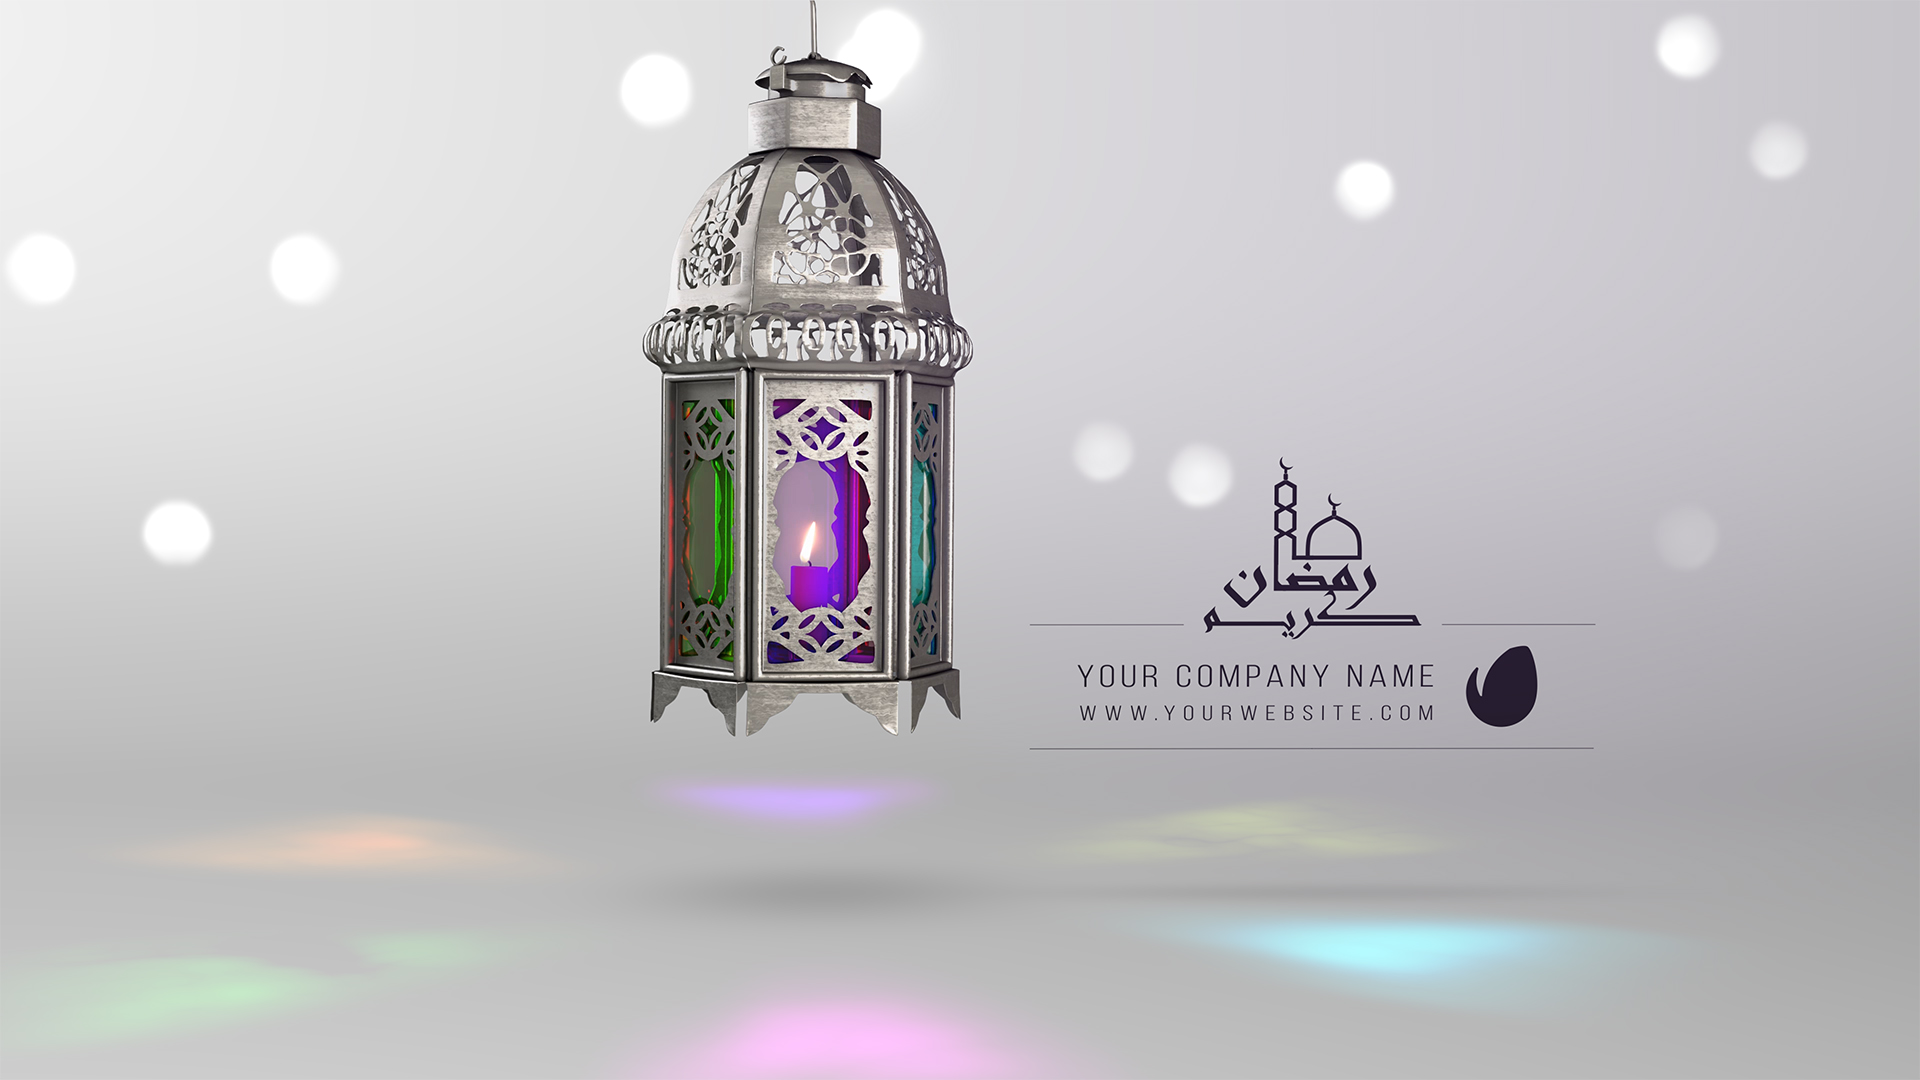 4K Lantern - Ramadan Free After Effects Template - Free After ...